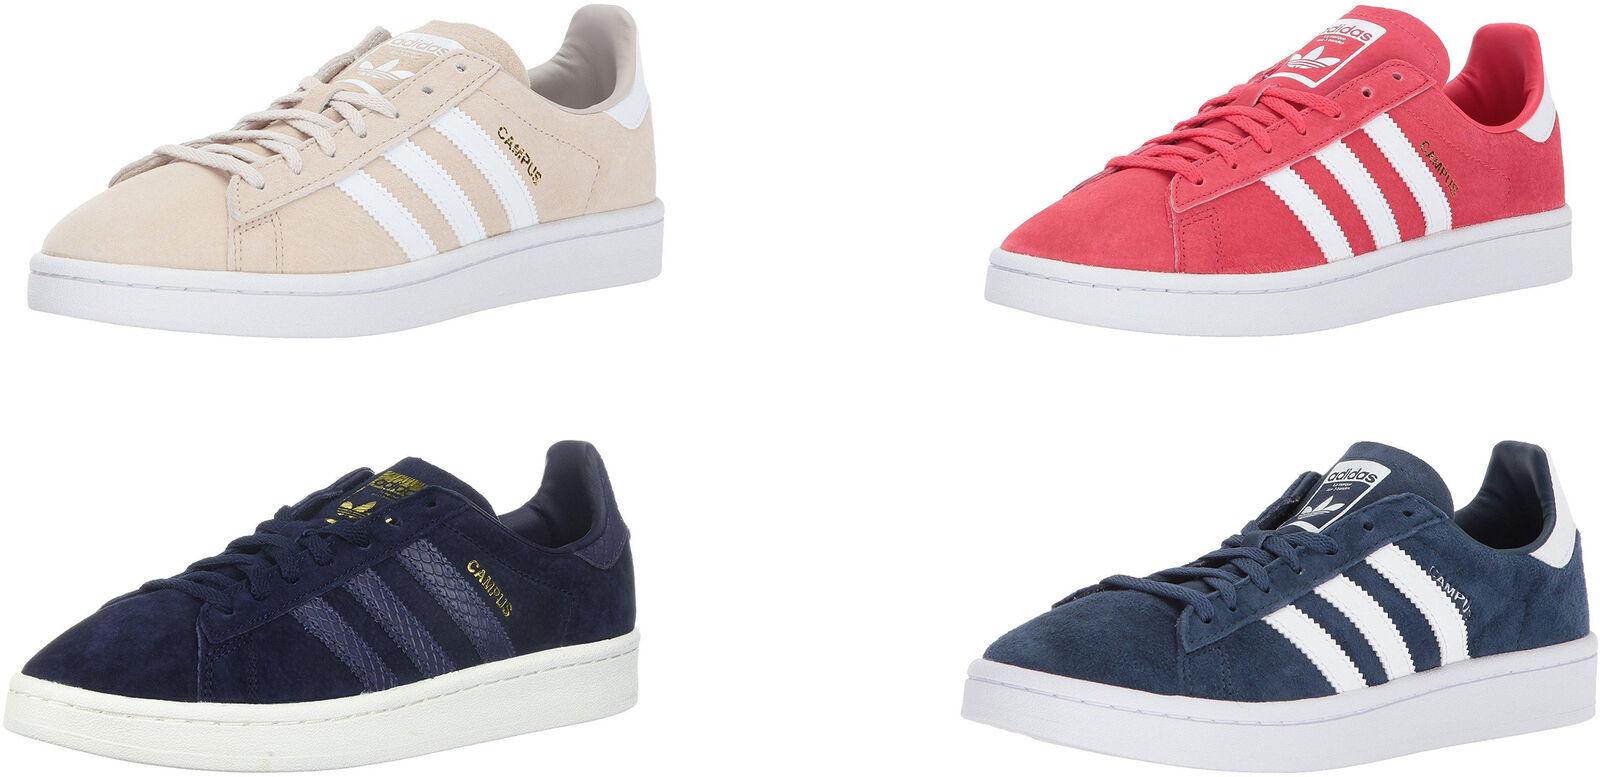 adidas Originals Women's Campus Sneakers, 4 Colors